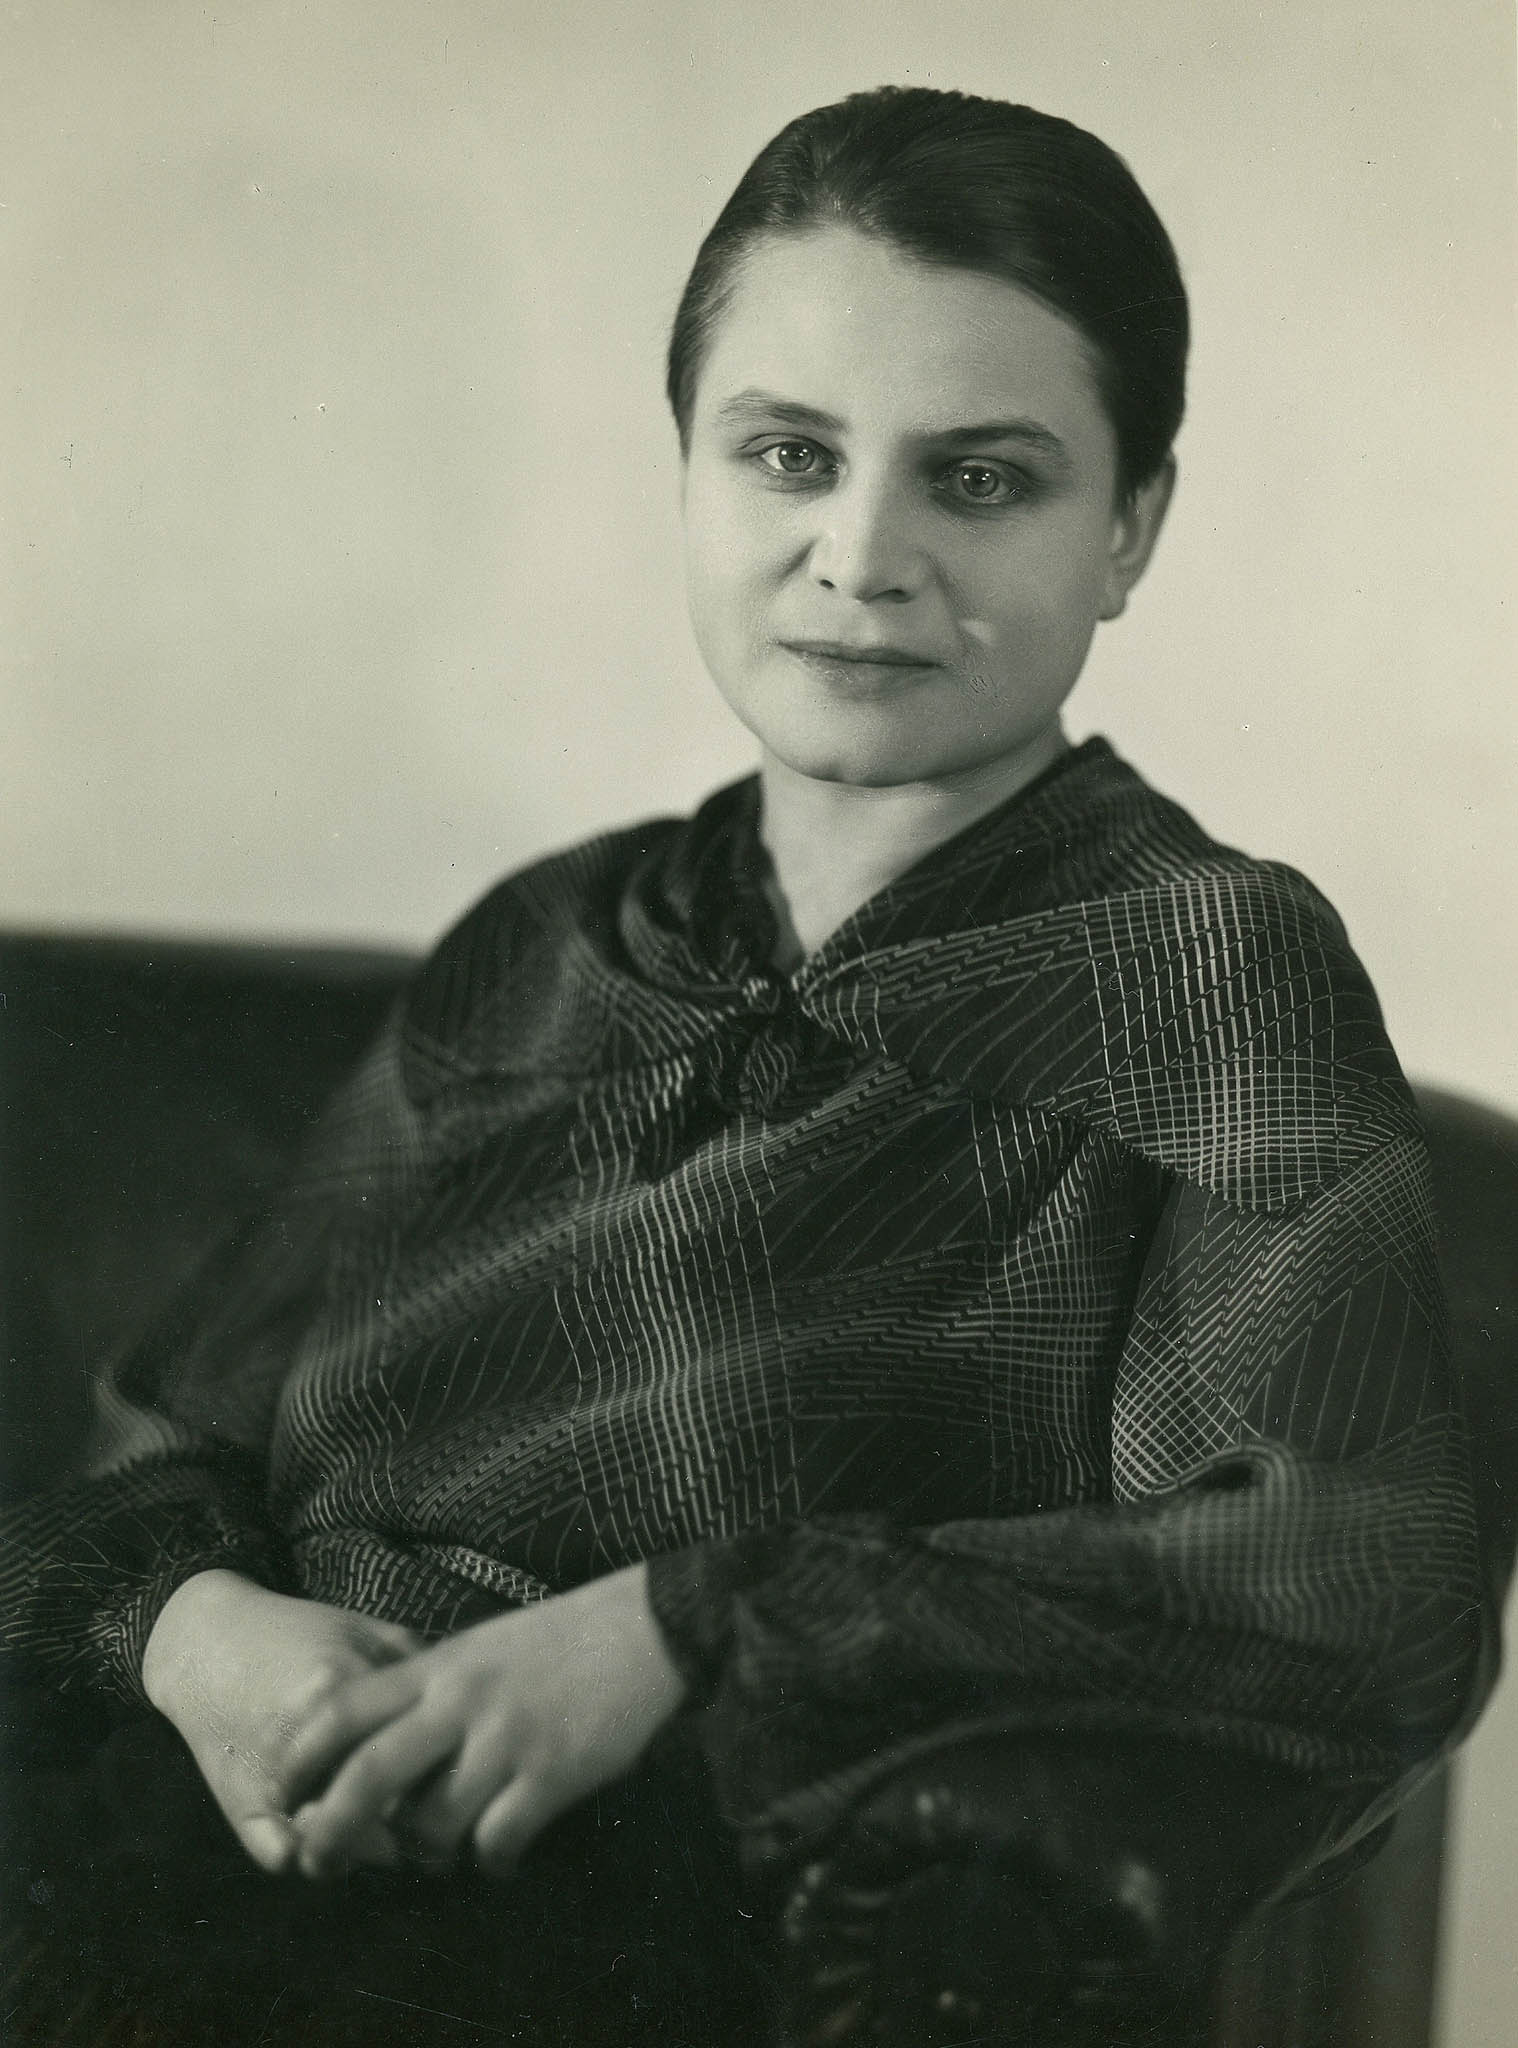 Momentka zroku 1932